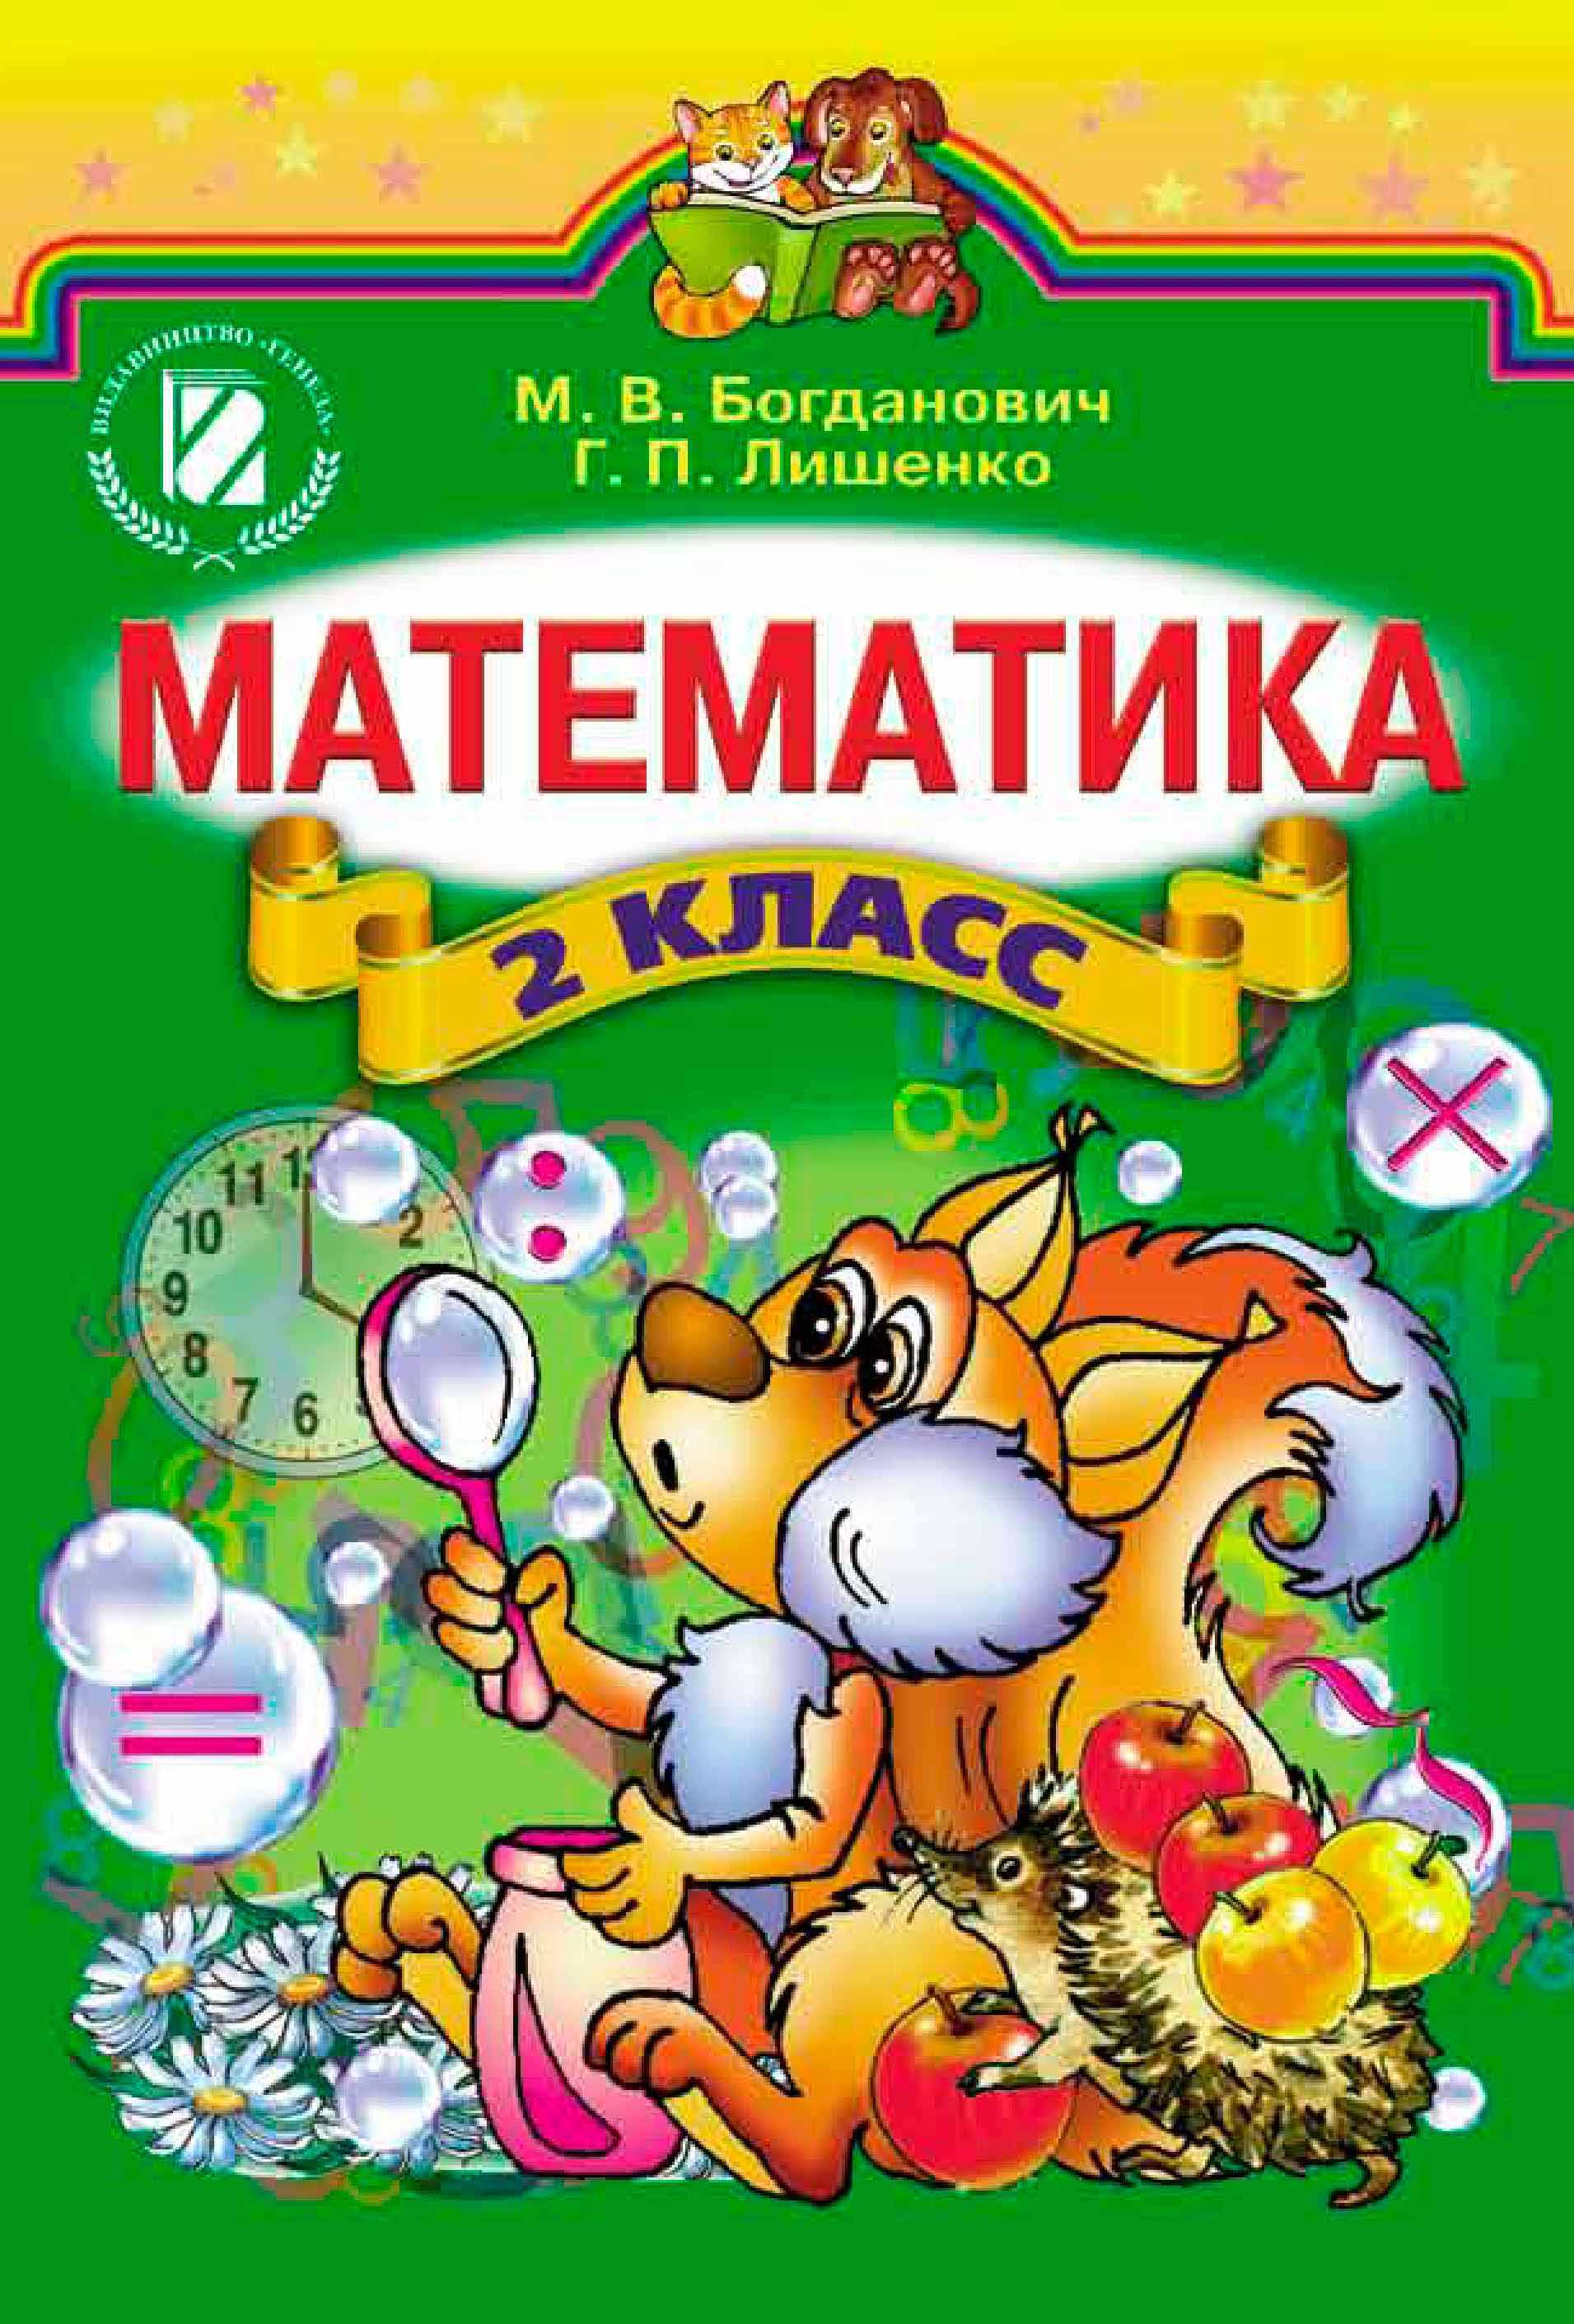 Гдз математика 2 класса богданович лишенко